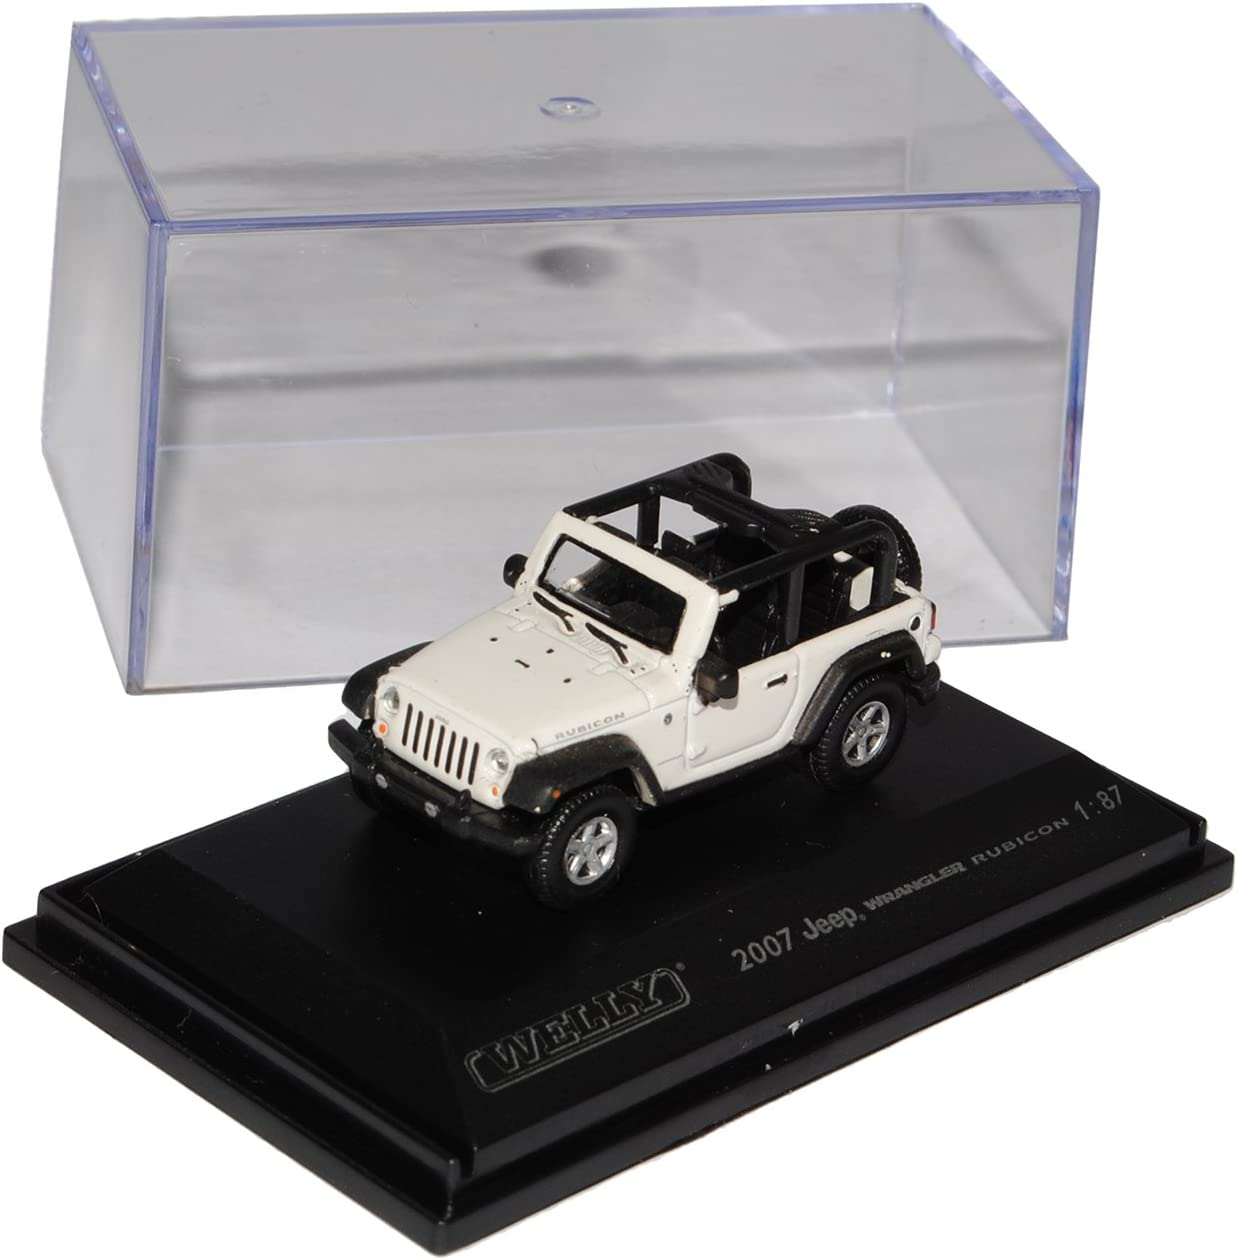 Welly Jeep Wrangler Rubicon Weiss Cabrio Jk Ab 2007 H0 1 87 Modell Auto Spielzeug